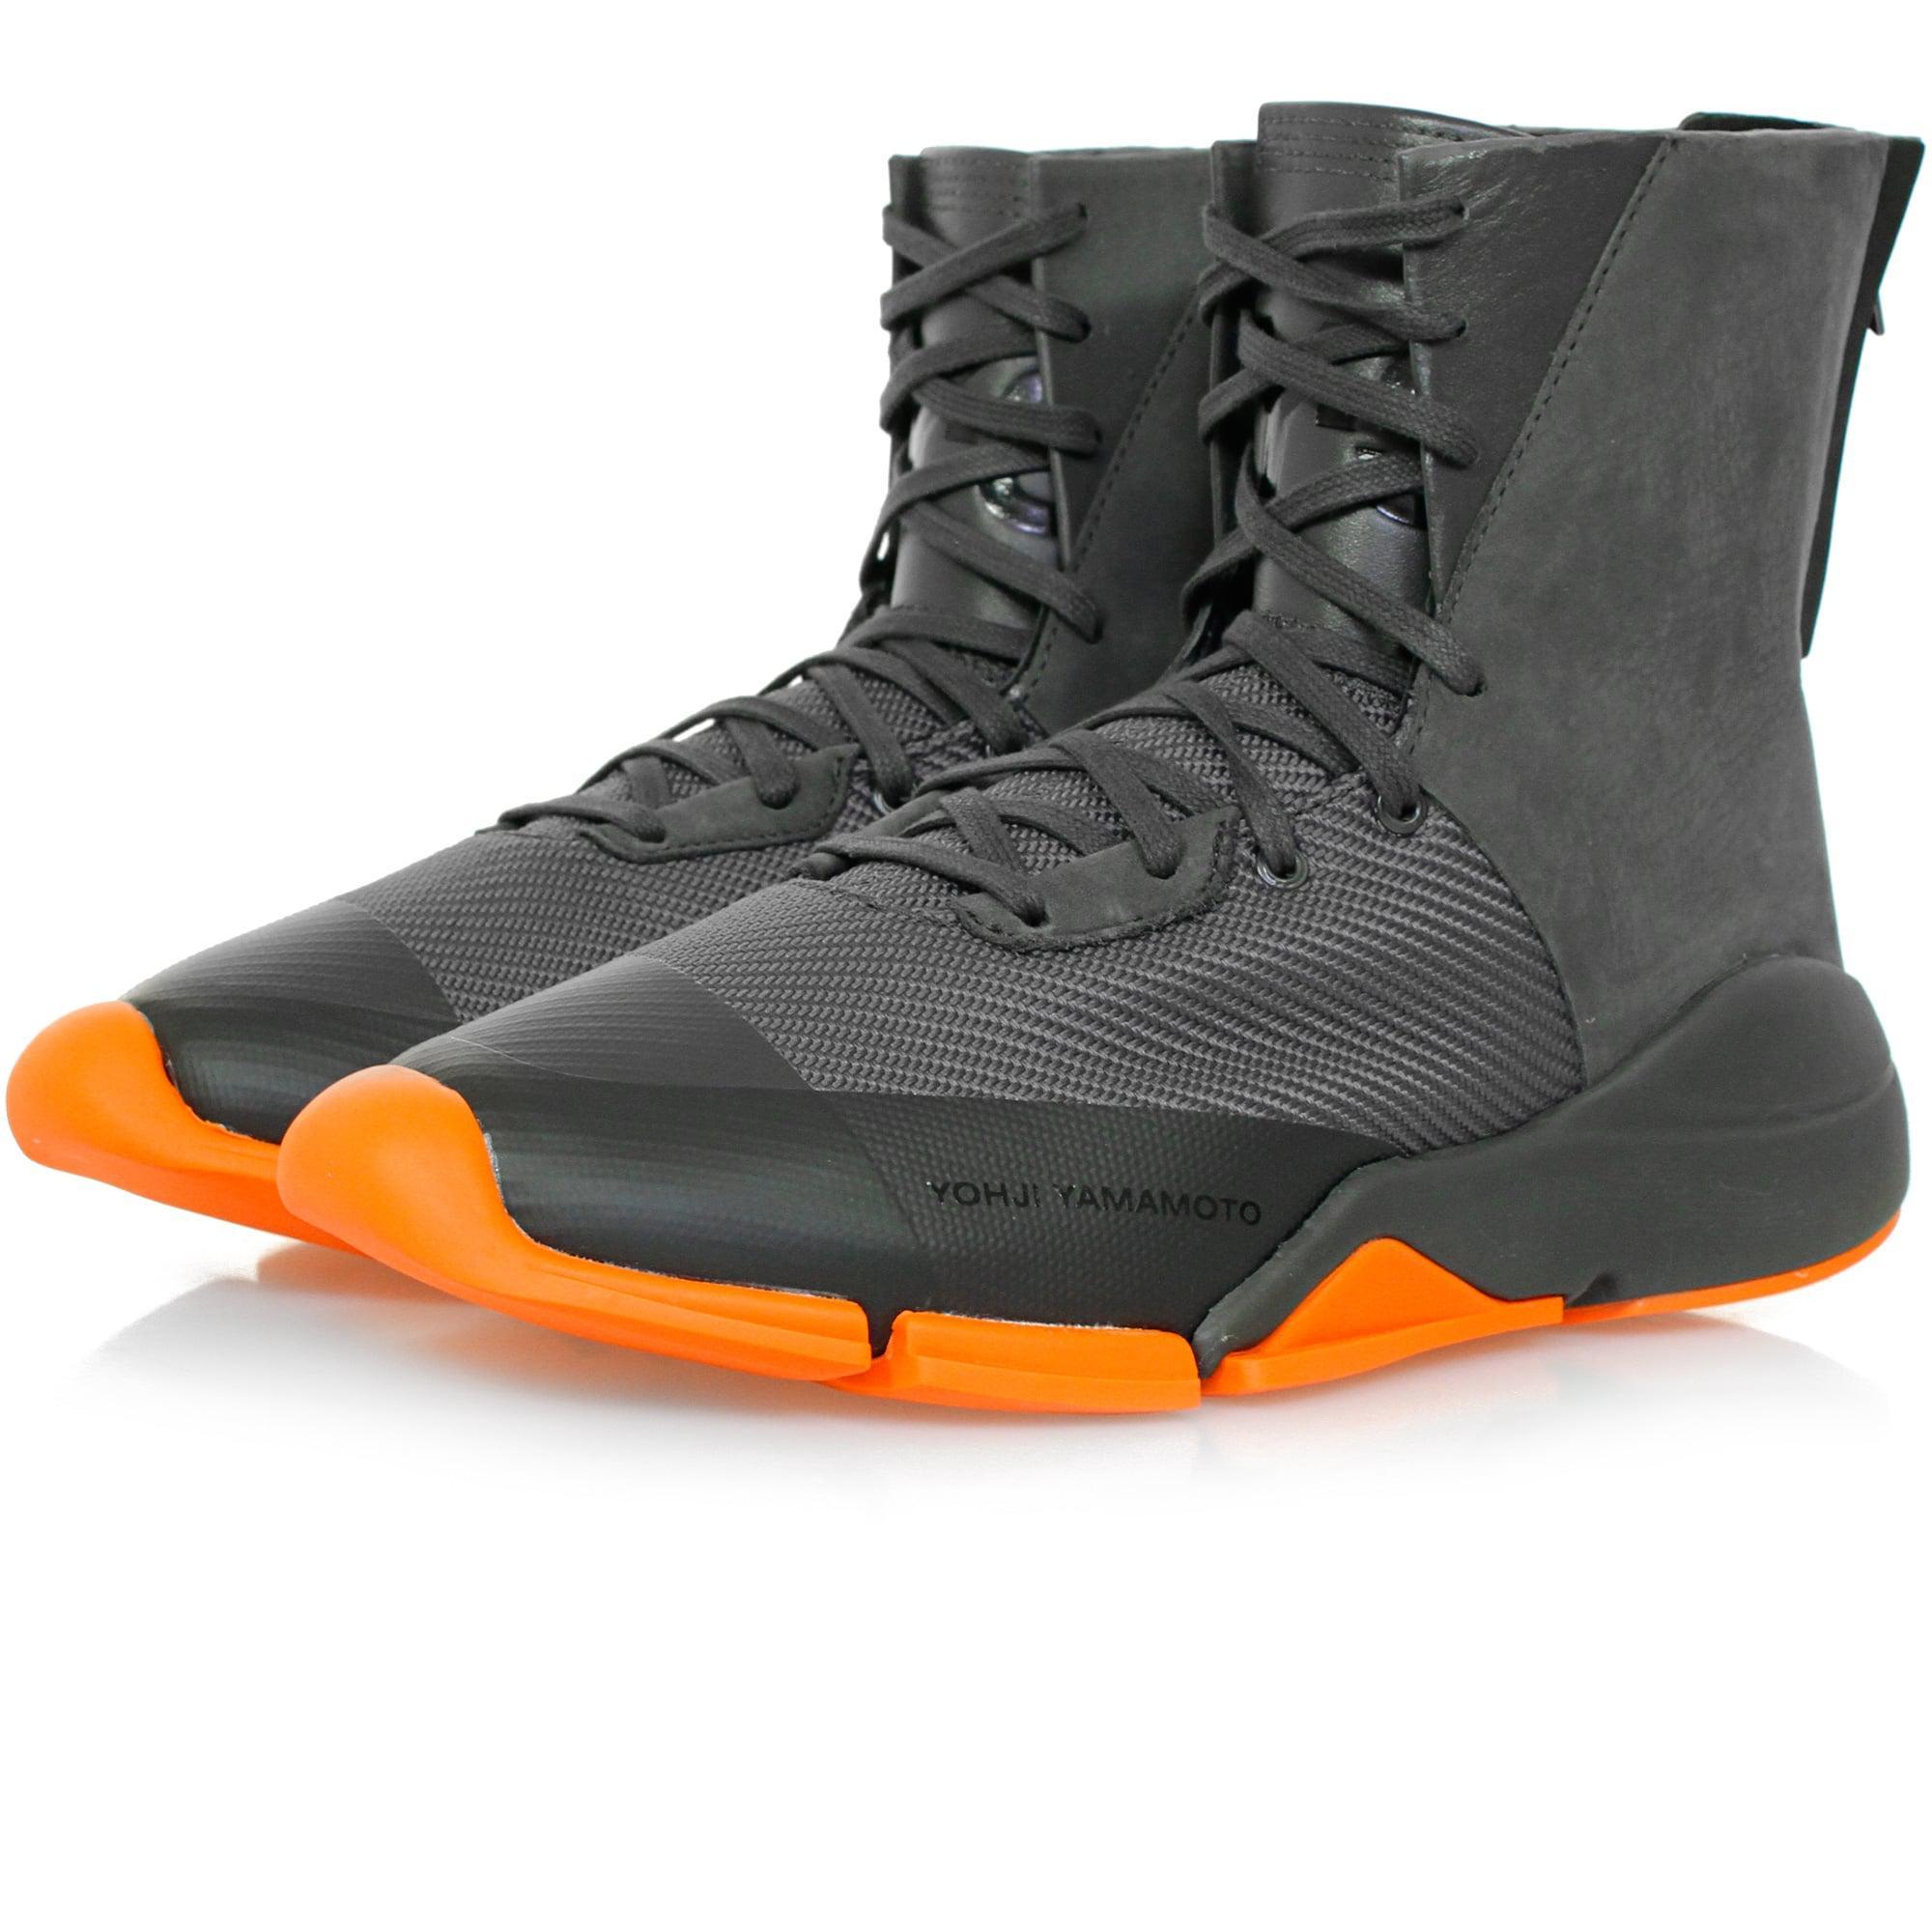 0de70942cfd8a Y-3 Future Zip High Chamel Boot Bb4806 for Men - Lyst